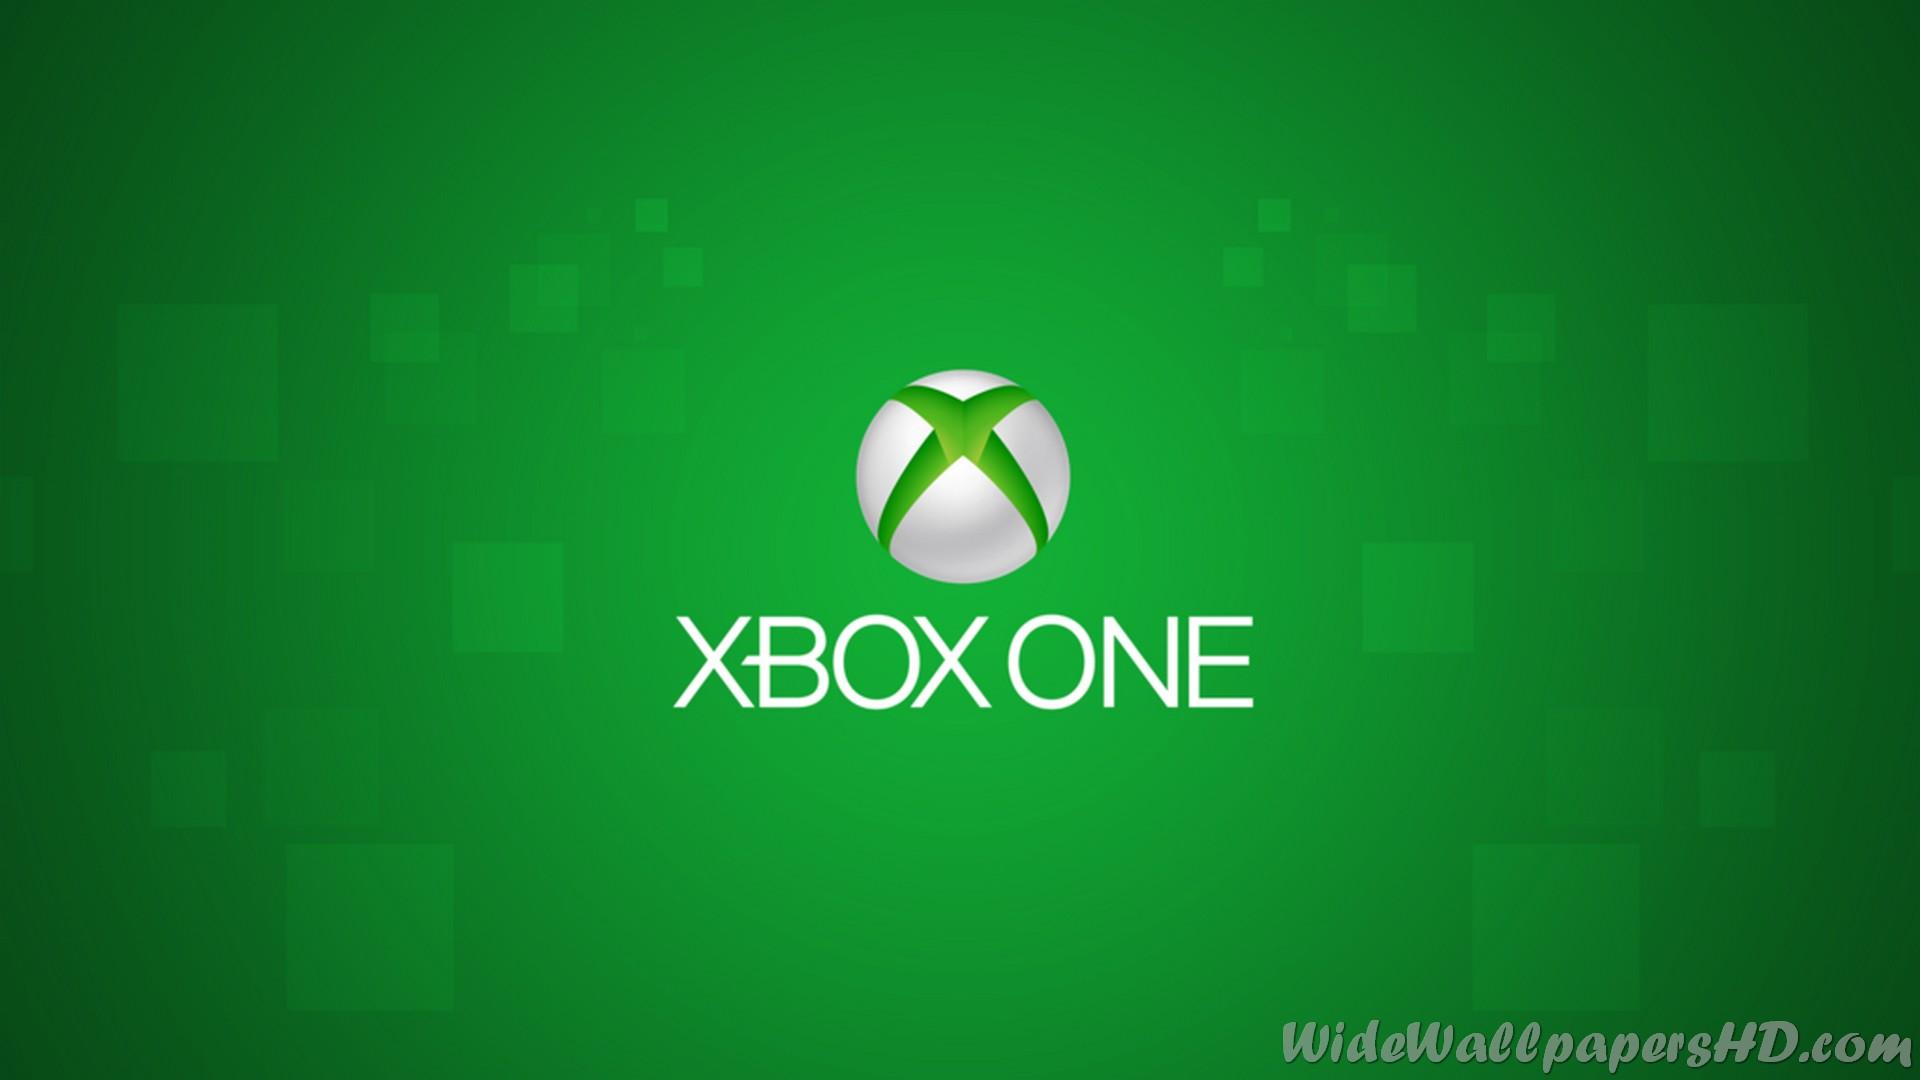 Xbox Hd Wallpaper Xbox hd green 1920x1080